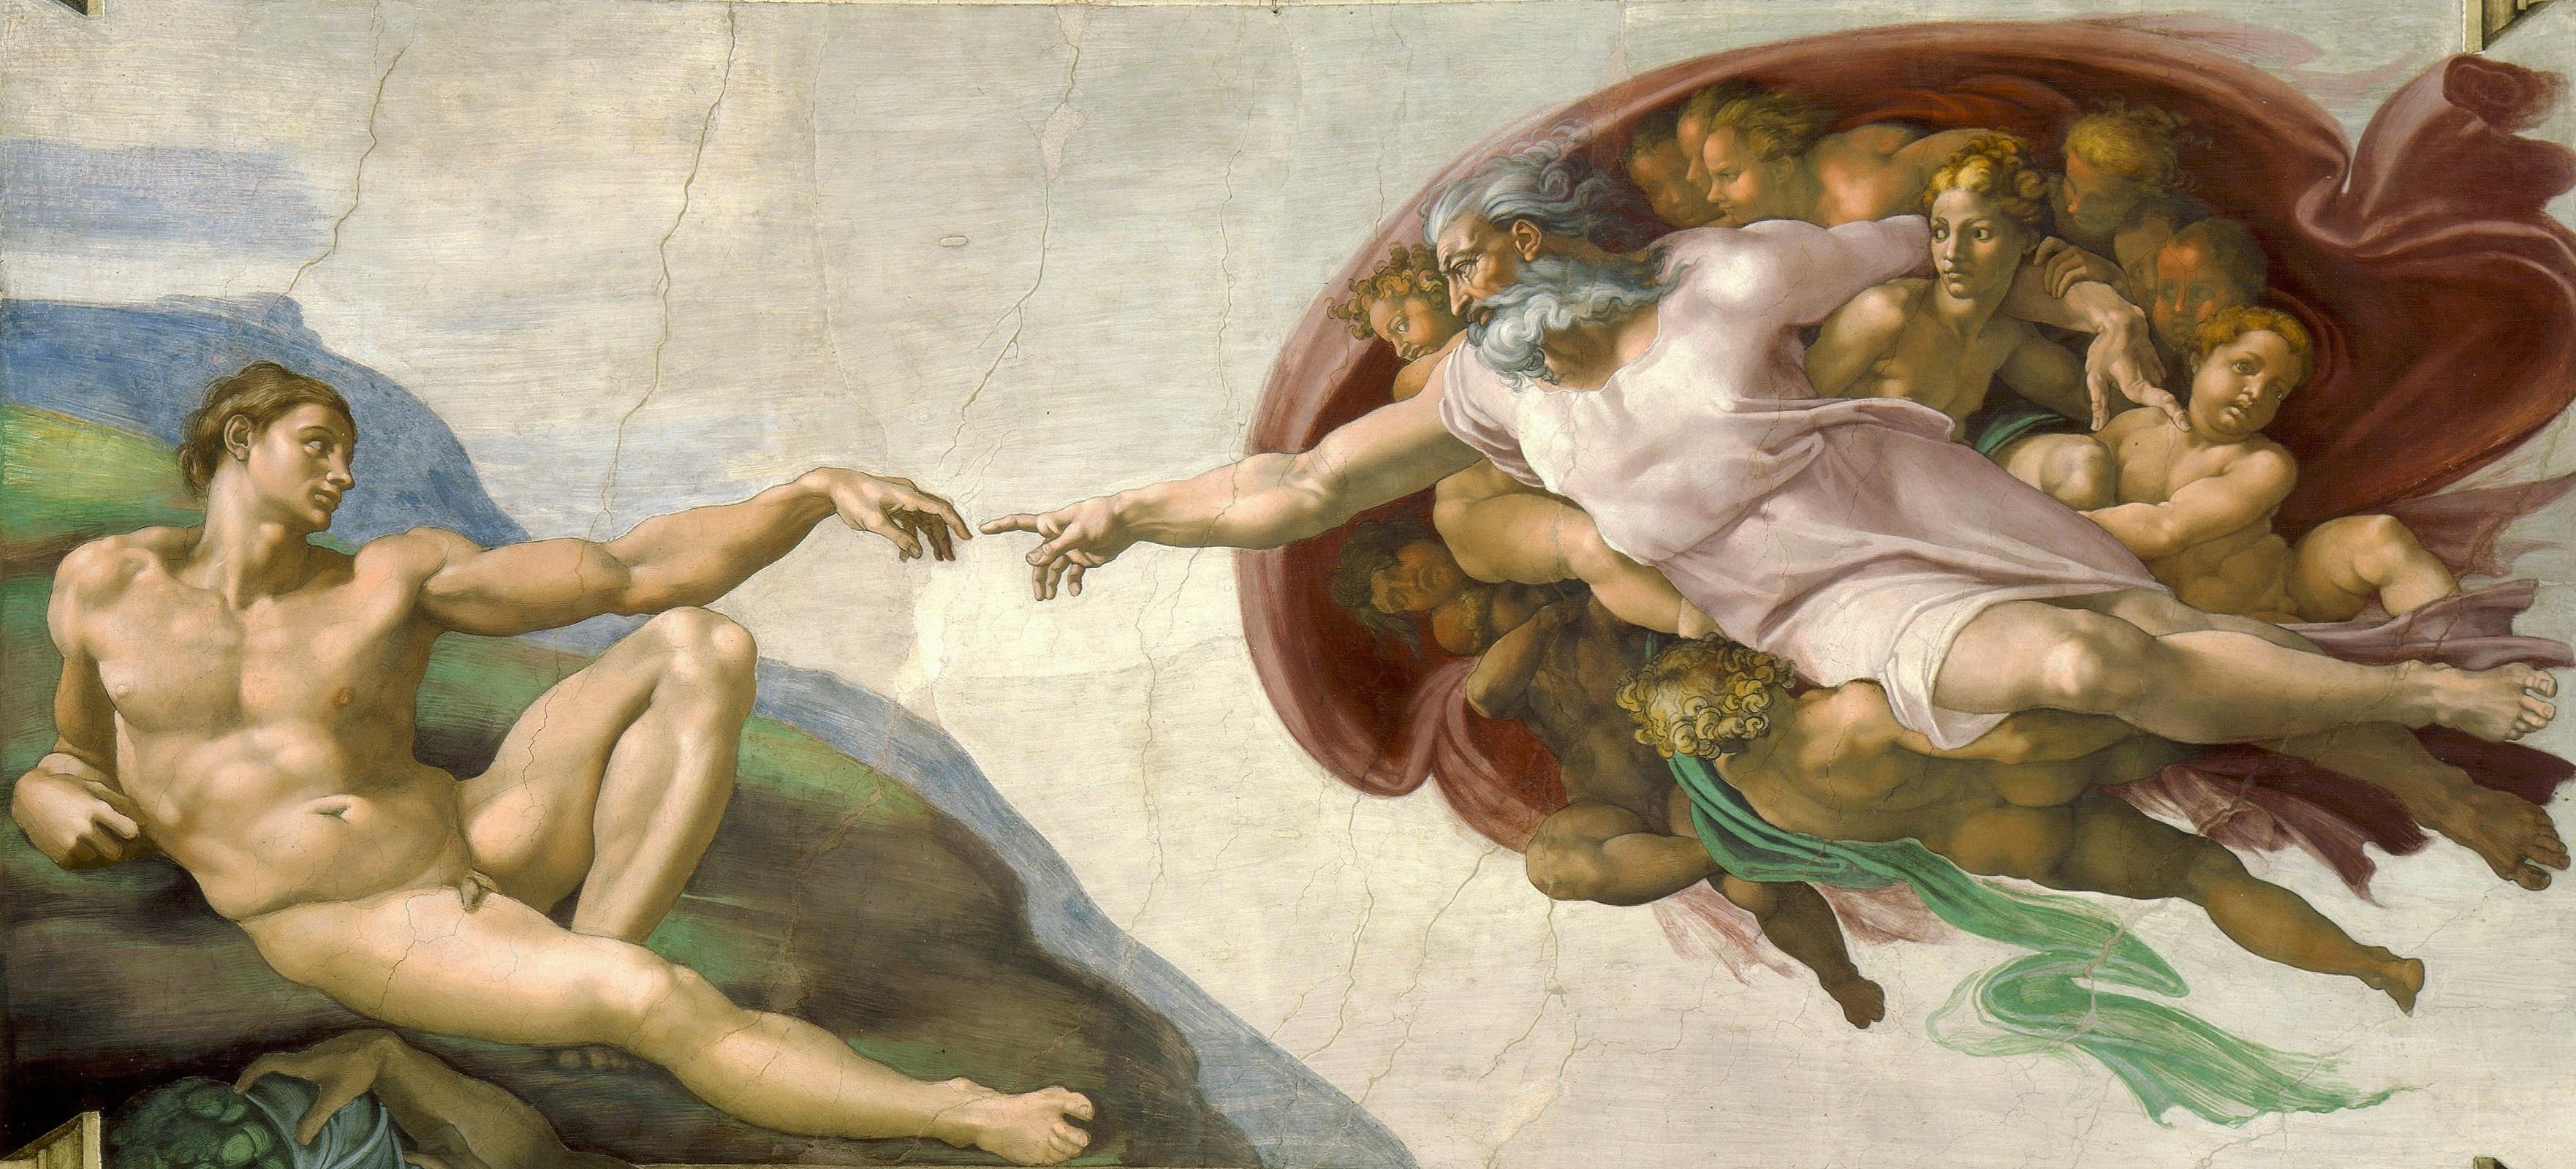 The Creation of Adam - Wikipedia